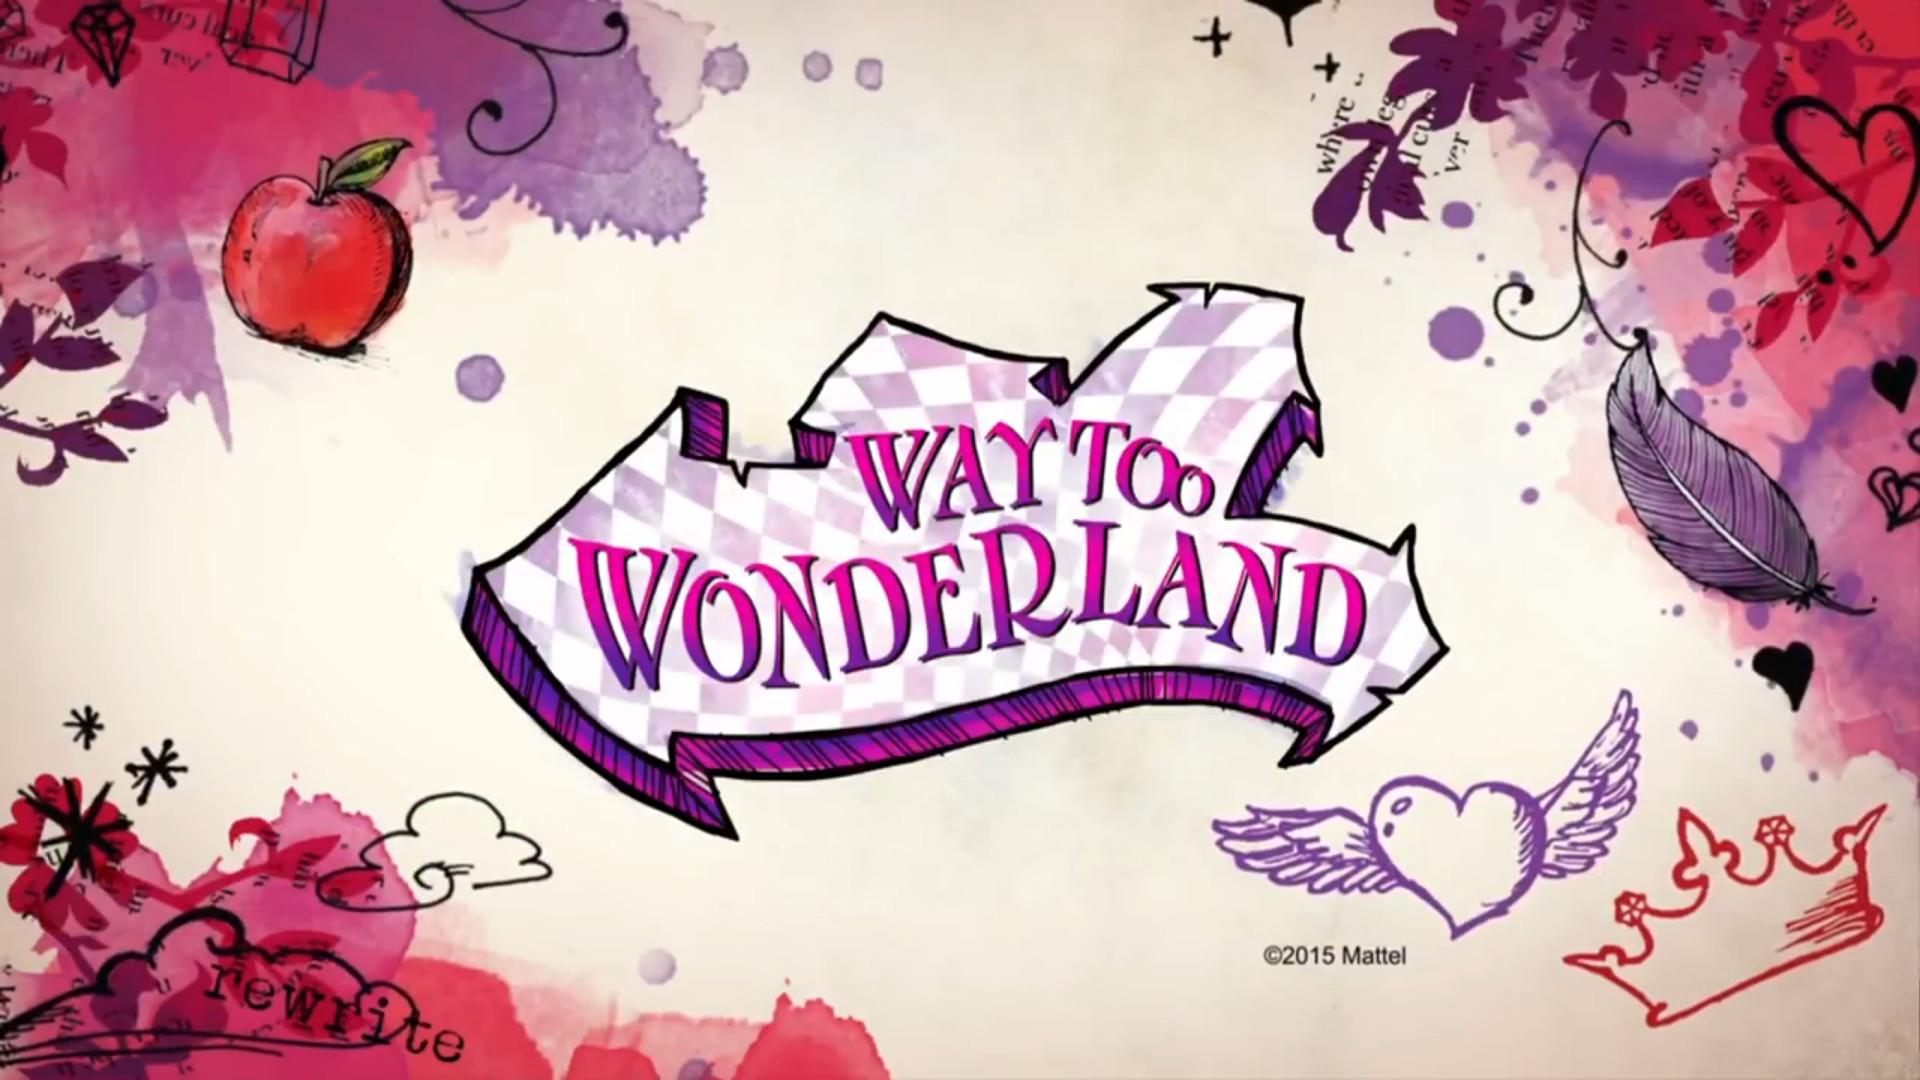 Way Too Wonderland | Royal & Rebel Pedia Wiki | FANDOM powered by Wikia